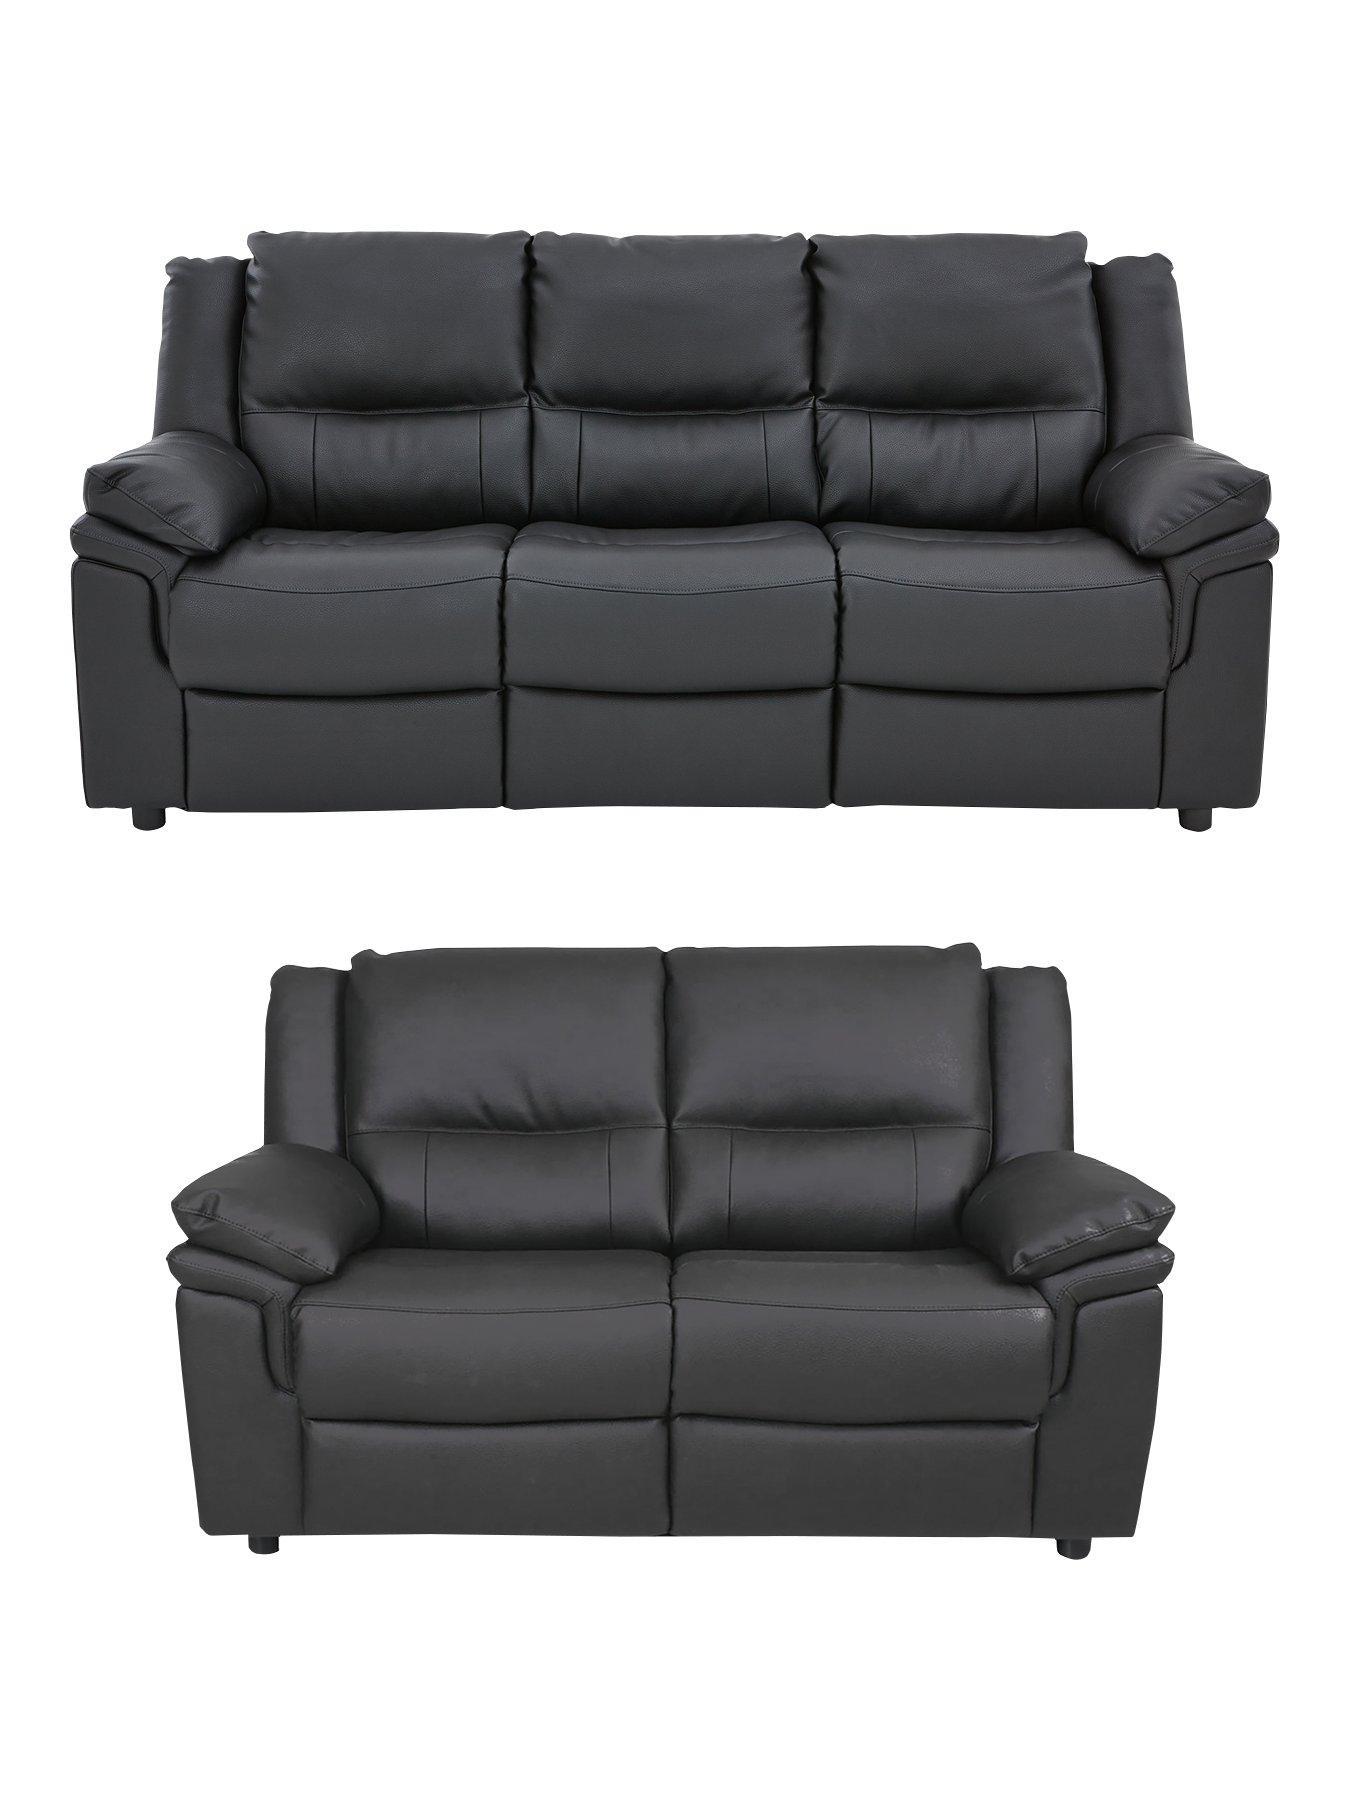 Leather | Sofas | Home & garden |